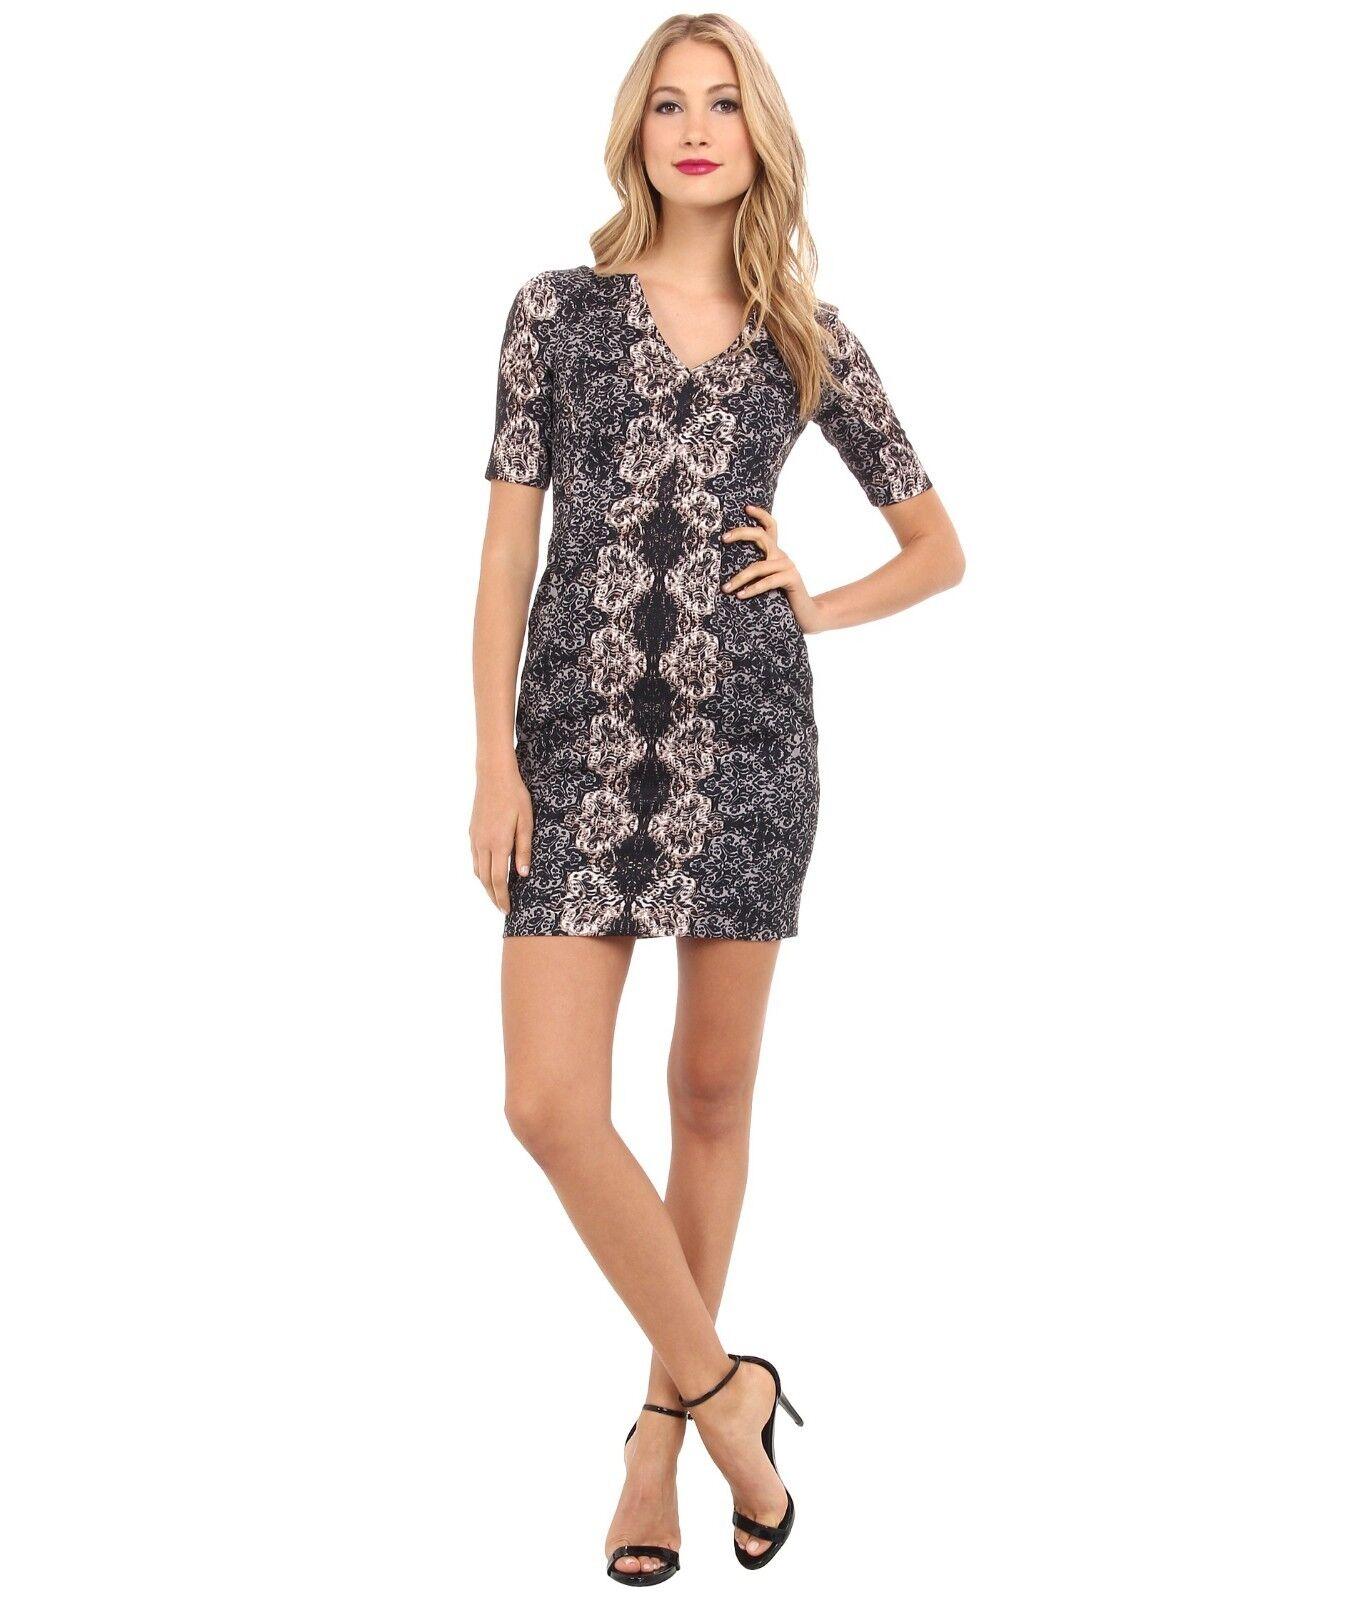 NWT Nanette Lepore damen schwarz Multi Merry Go Round Sheath Dress Größe 0